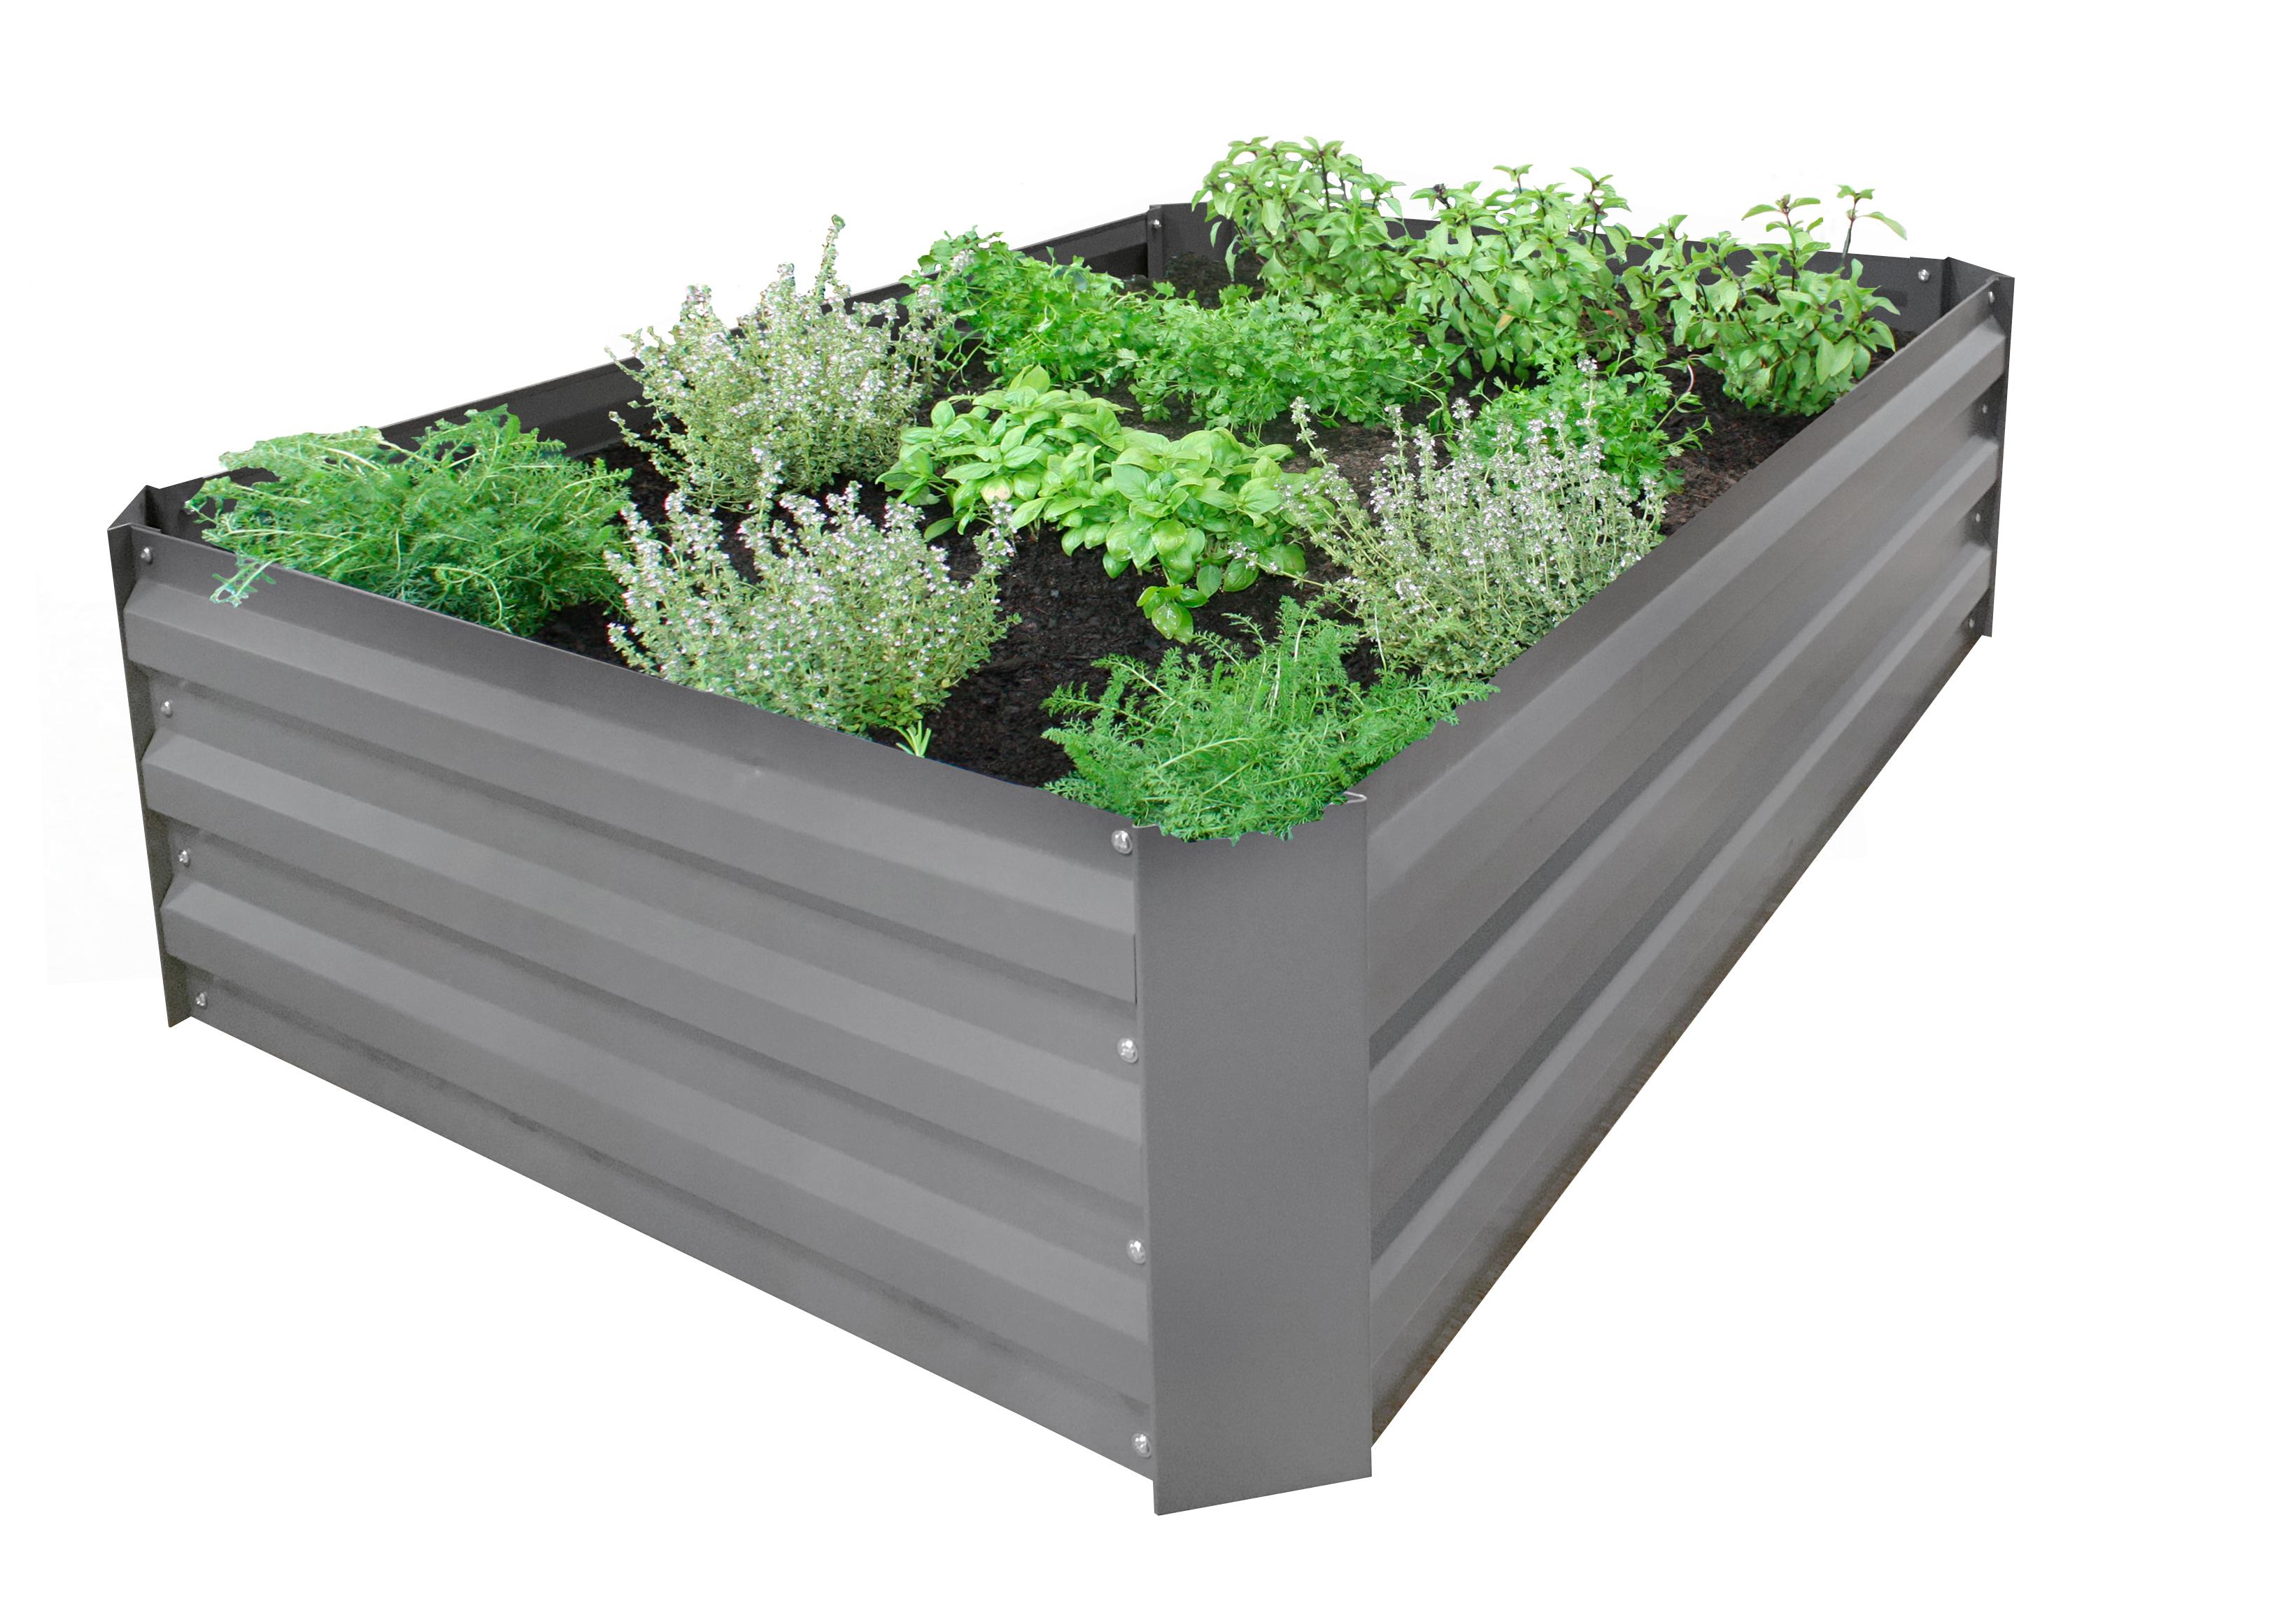 Gardenlife - Easy Raised Bed 80 x 120 cm - Medium (131661)